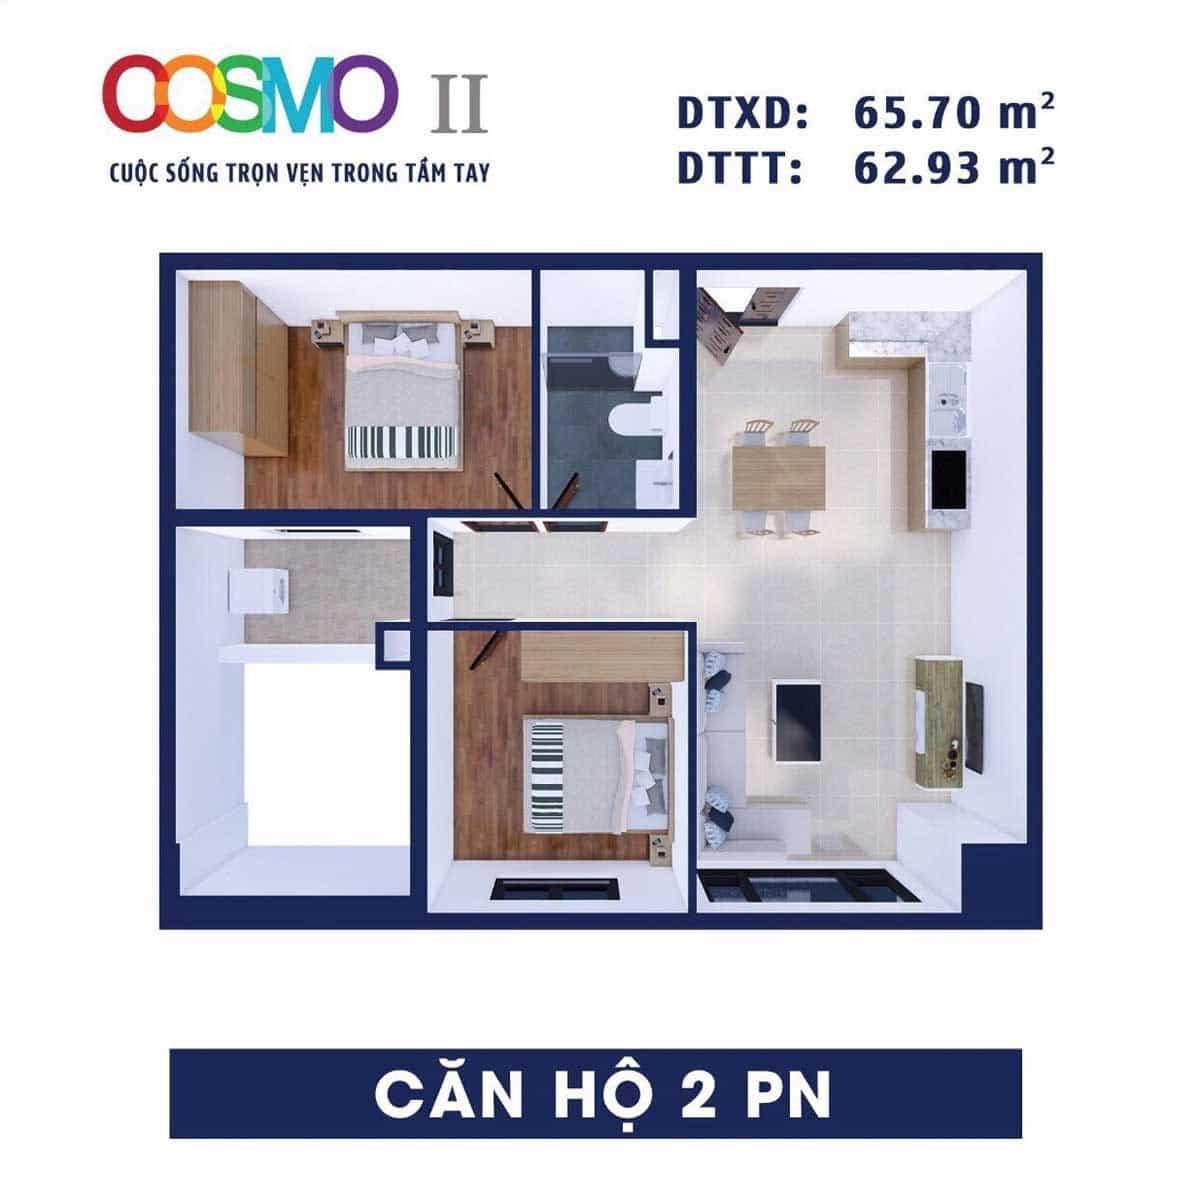 thiet-ke-can-ho-2-PN-dien-tich-65,7m2-cosmo-2